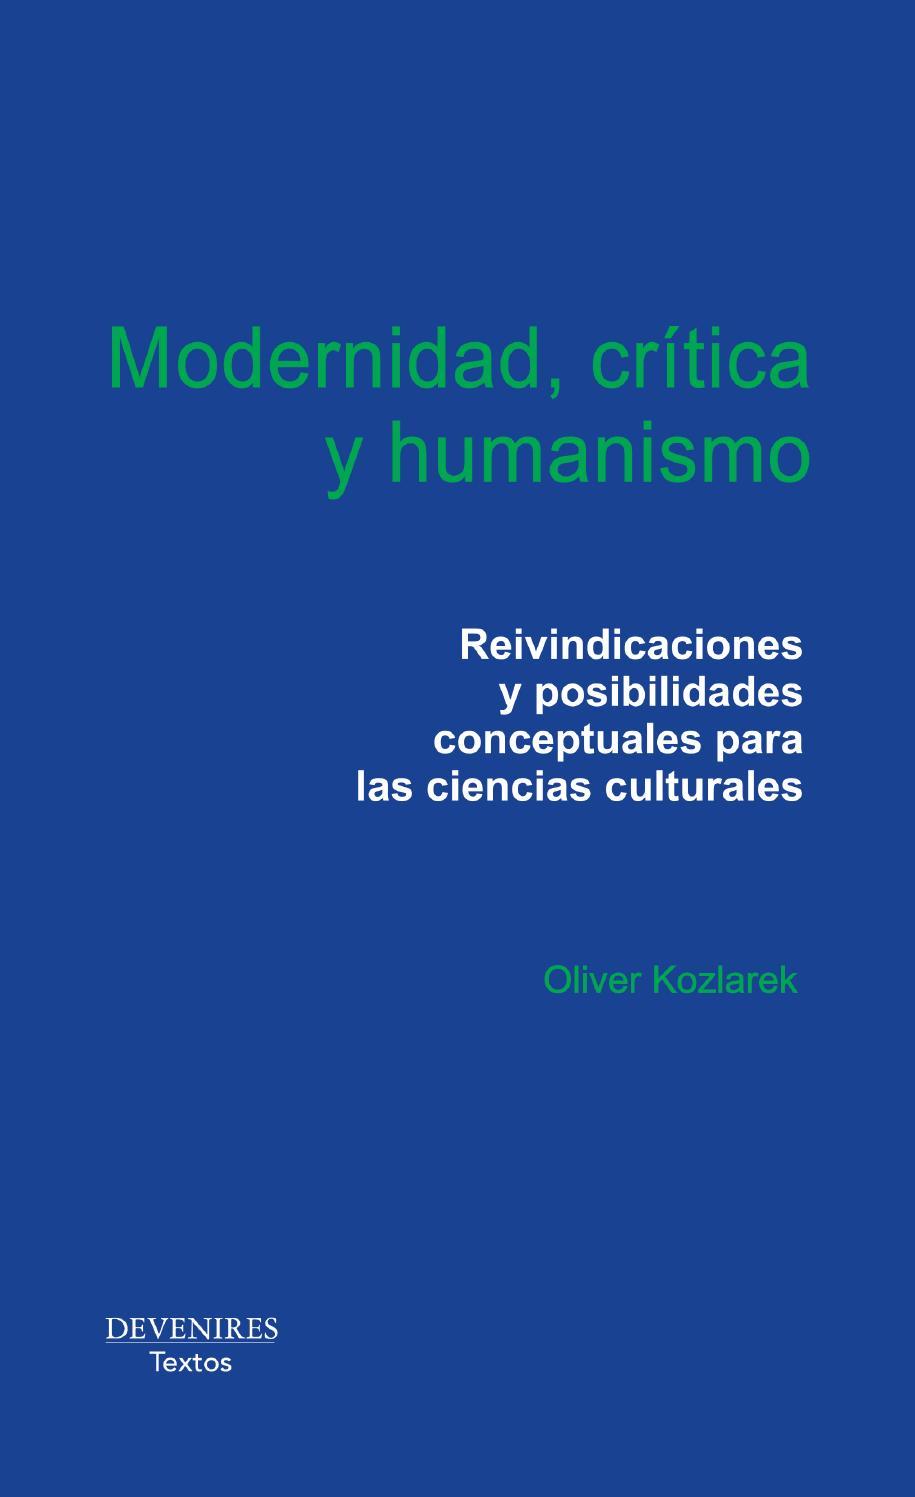 Modernidad, crítica y humanismo by Silla vacía Editorial - issuu